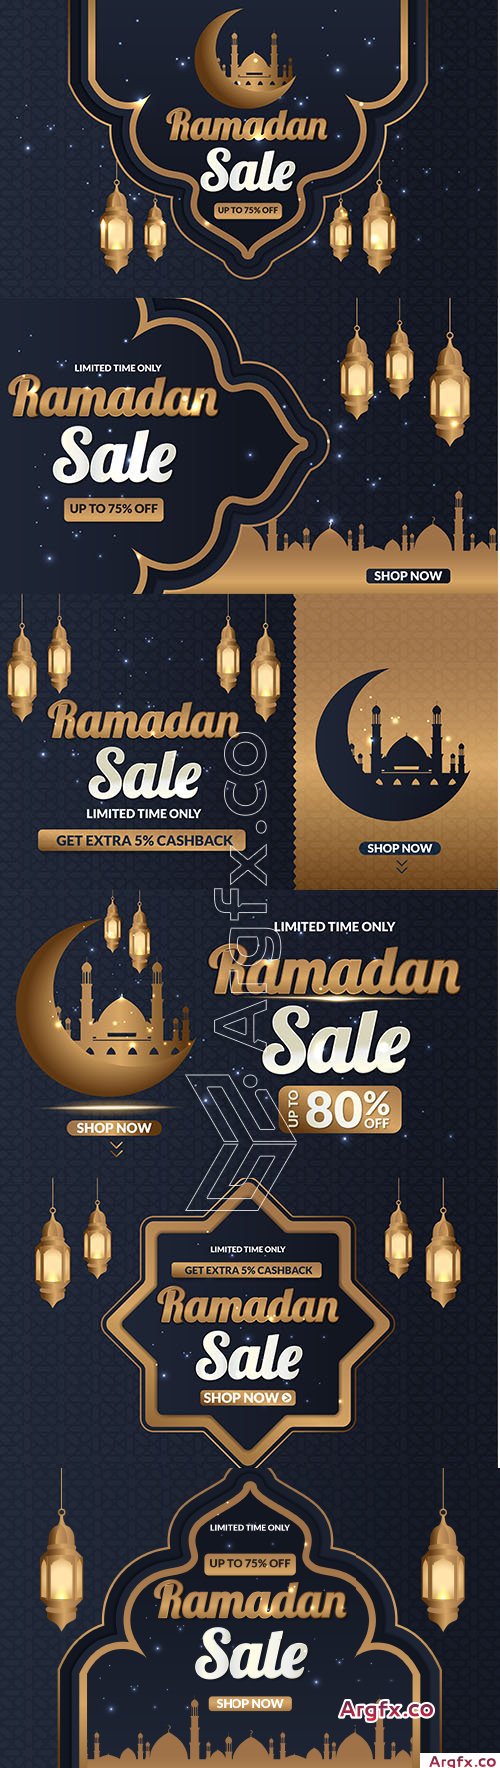 Ramadan Sale Banner Social Media Post Set